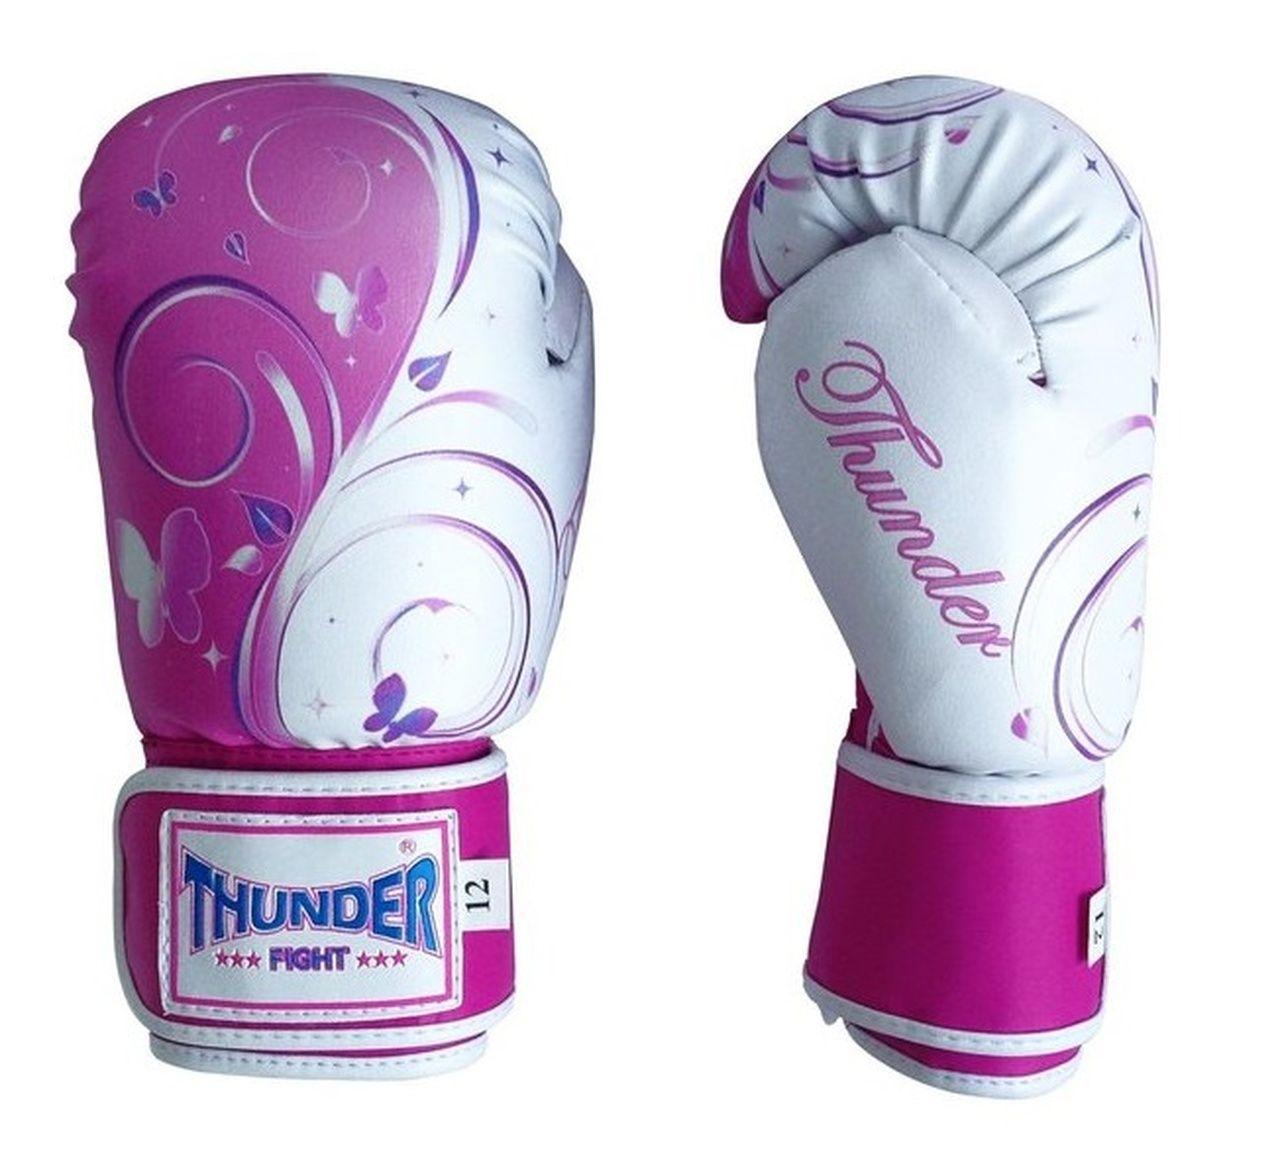 Luva de Boxe / Muay Thai 10oz Feminina - Borboleta Rosa - Thunder Fight  - PRALUTA SHOP